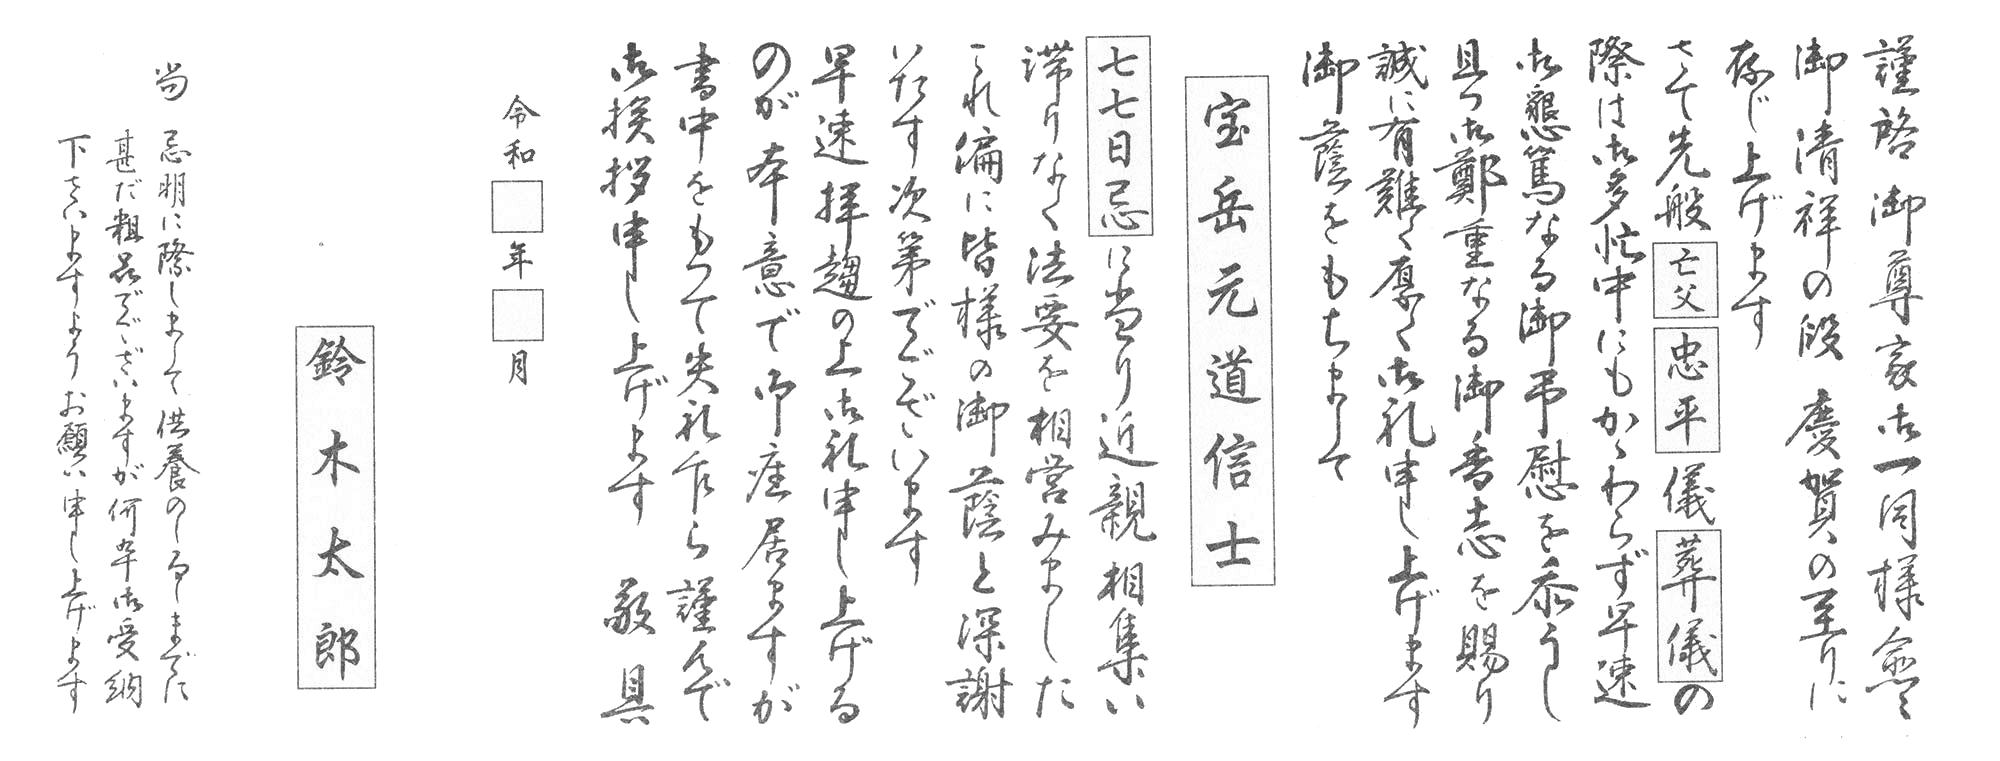 関東仏教用香典返し挨拶状